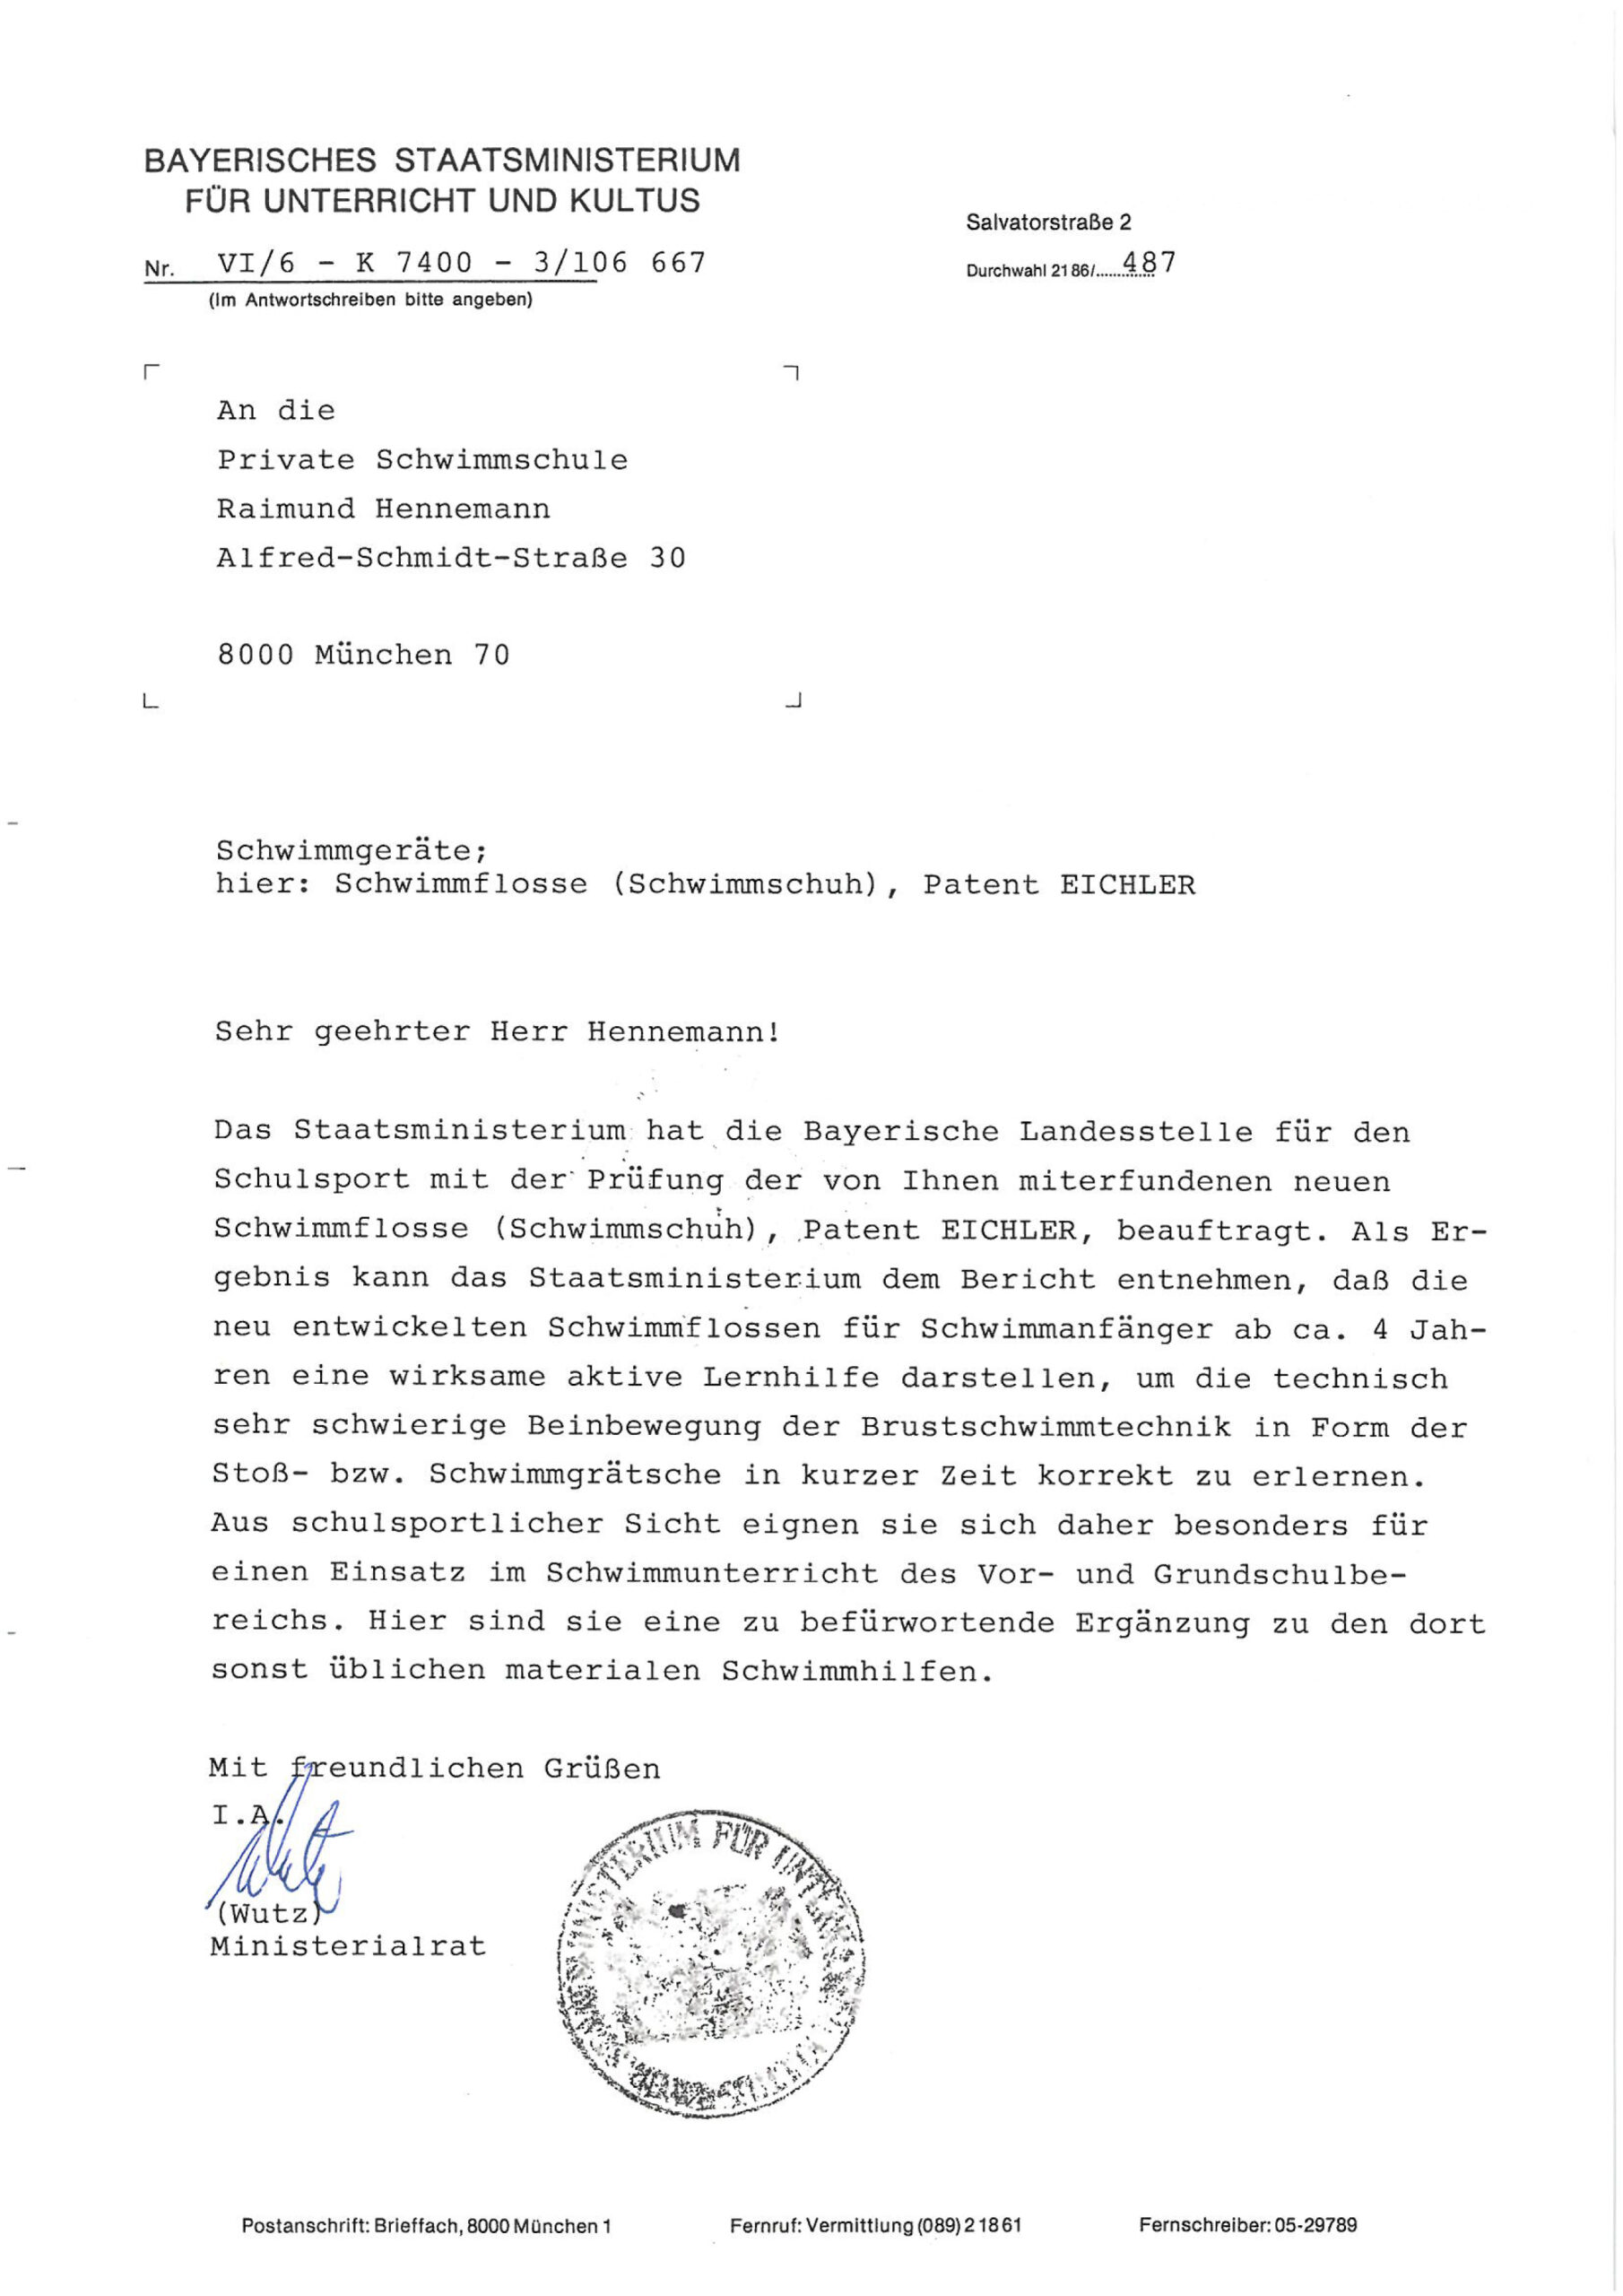 KUMI_1988_Beurteilung